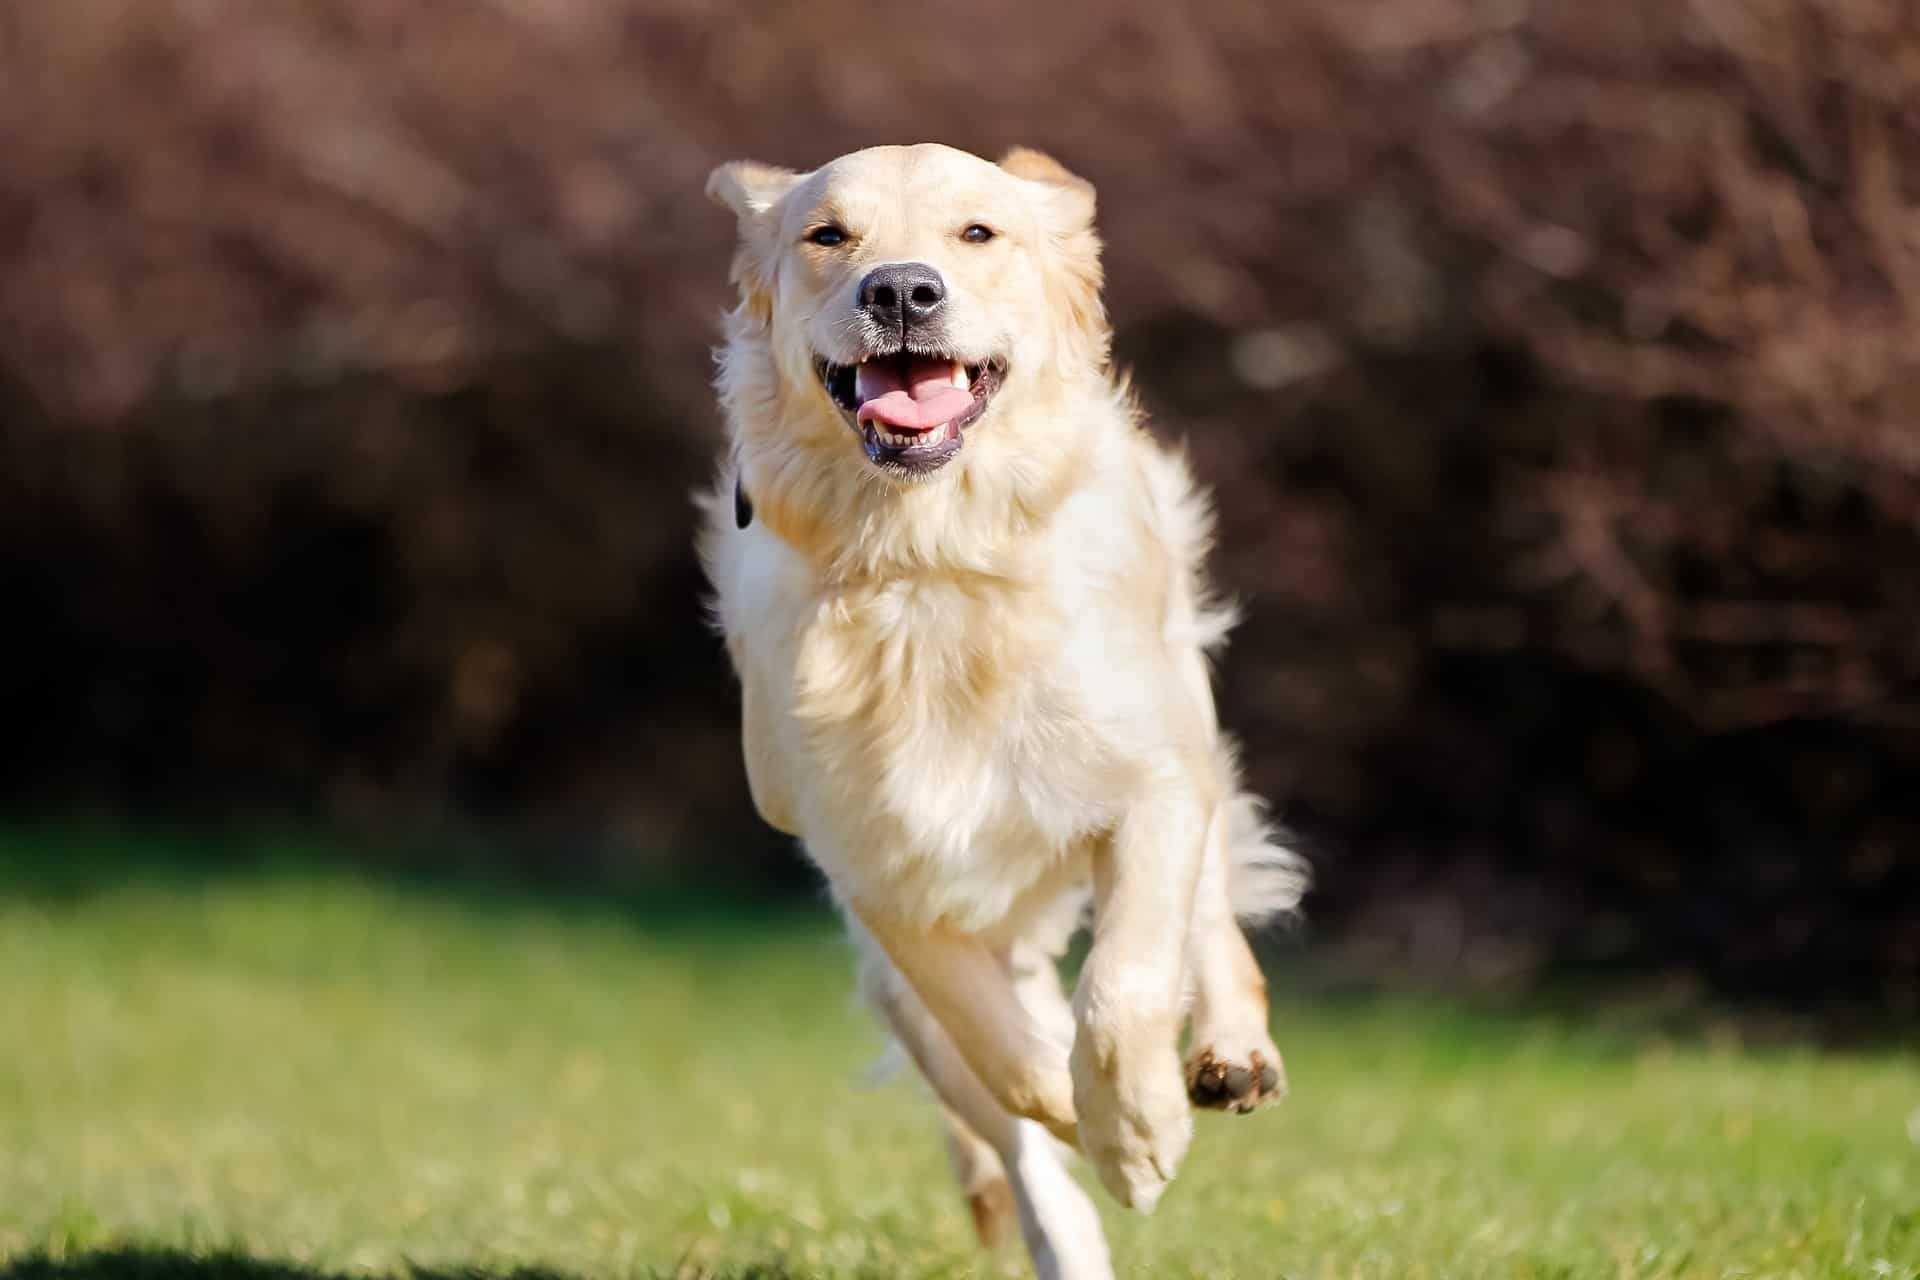 Dog Walking - Passeio de Cães